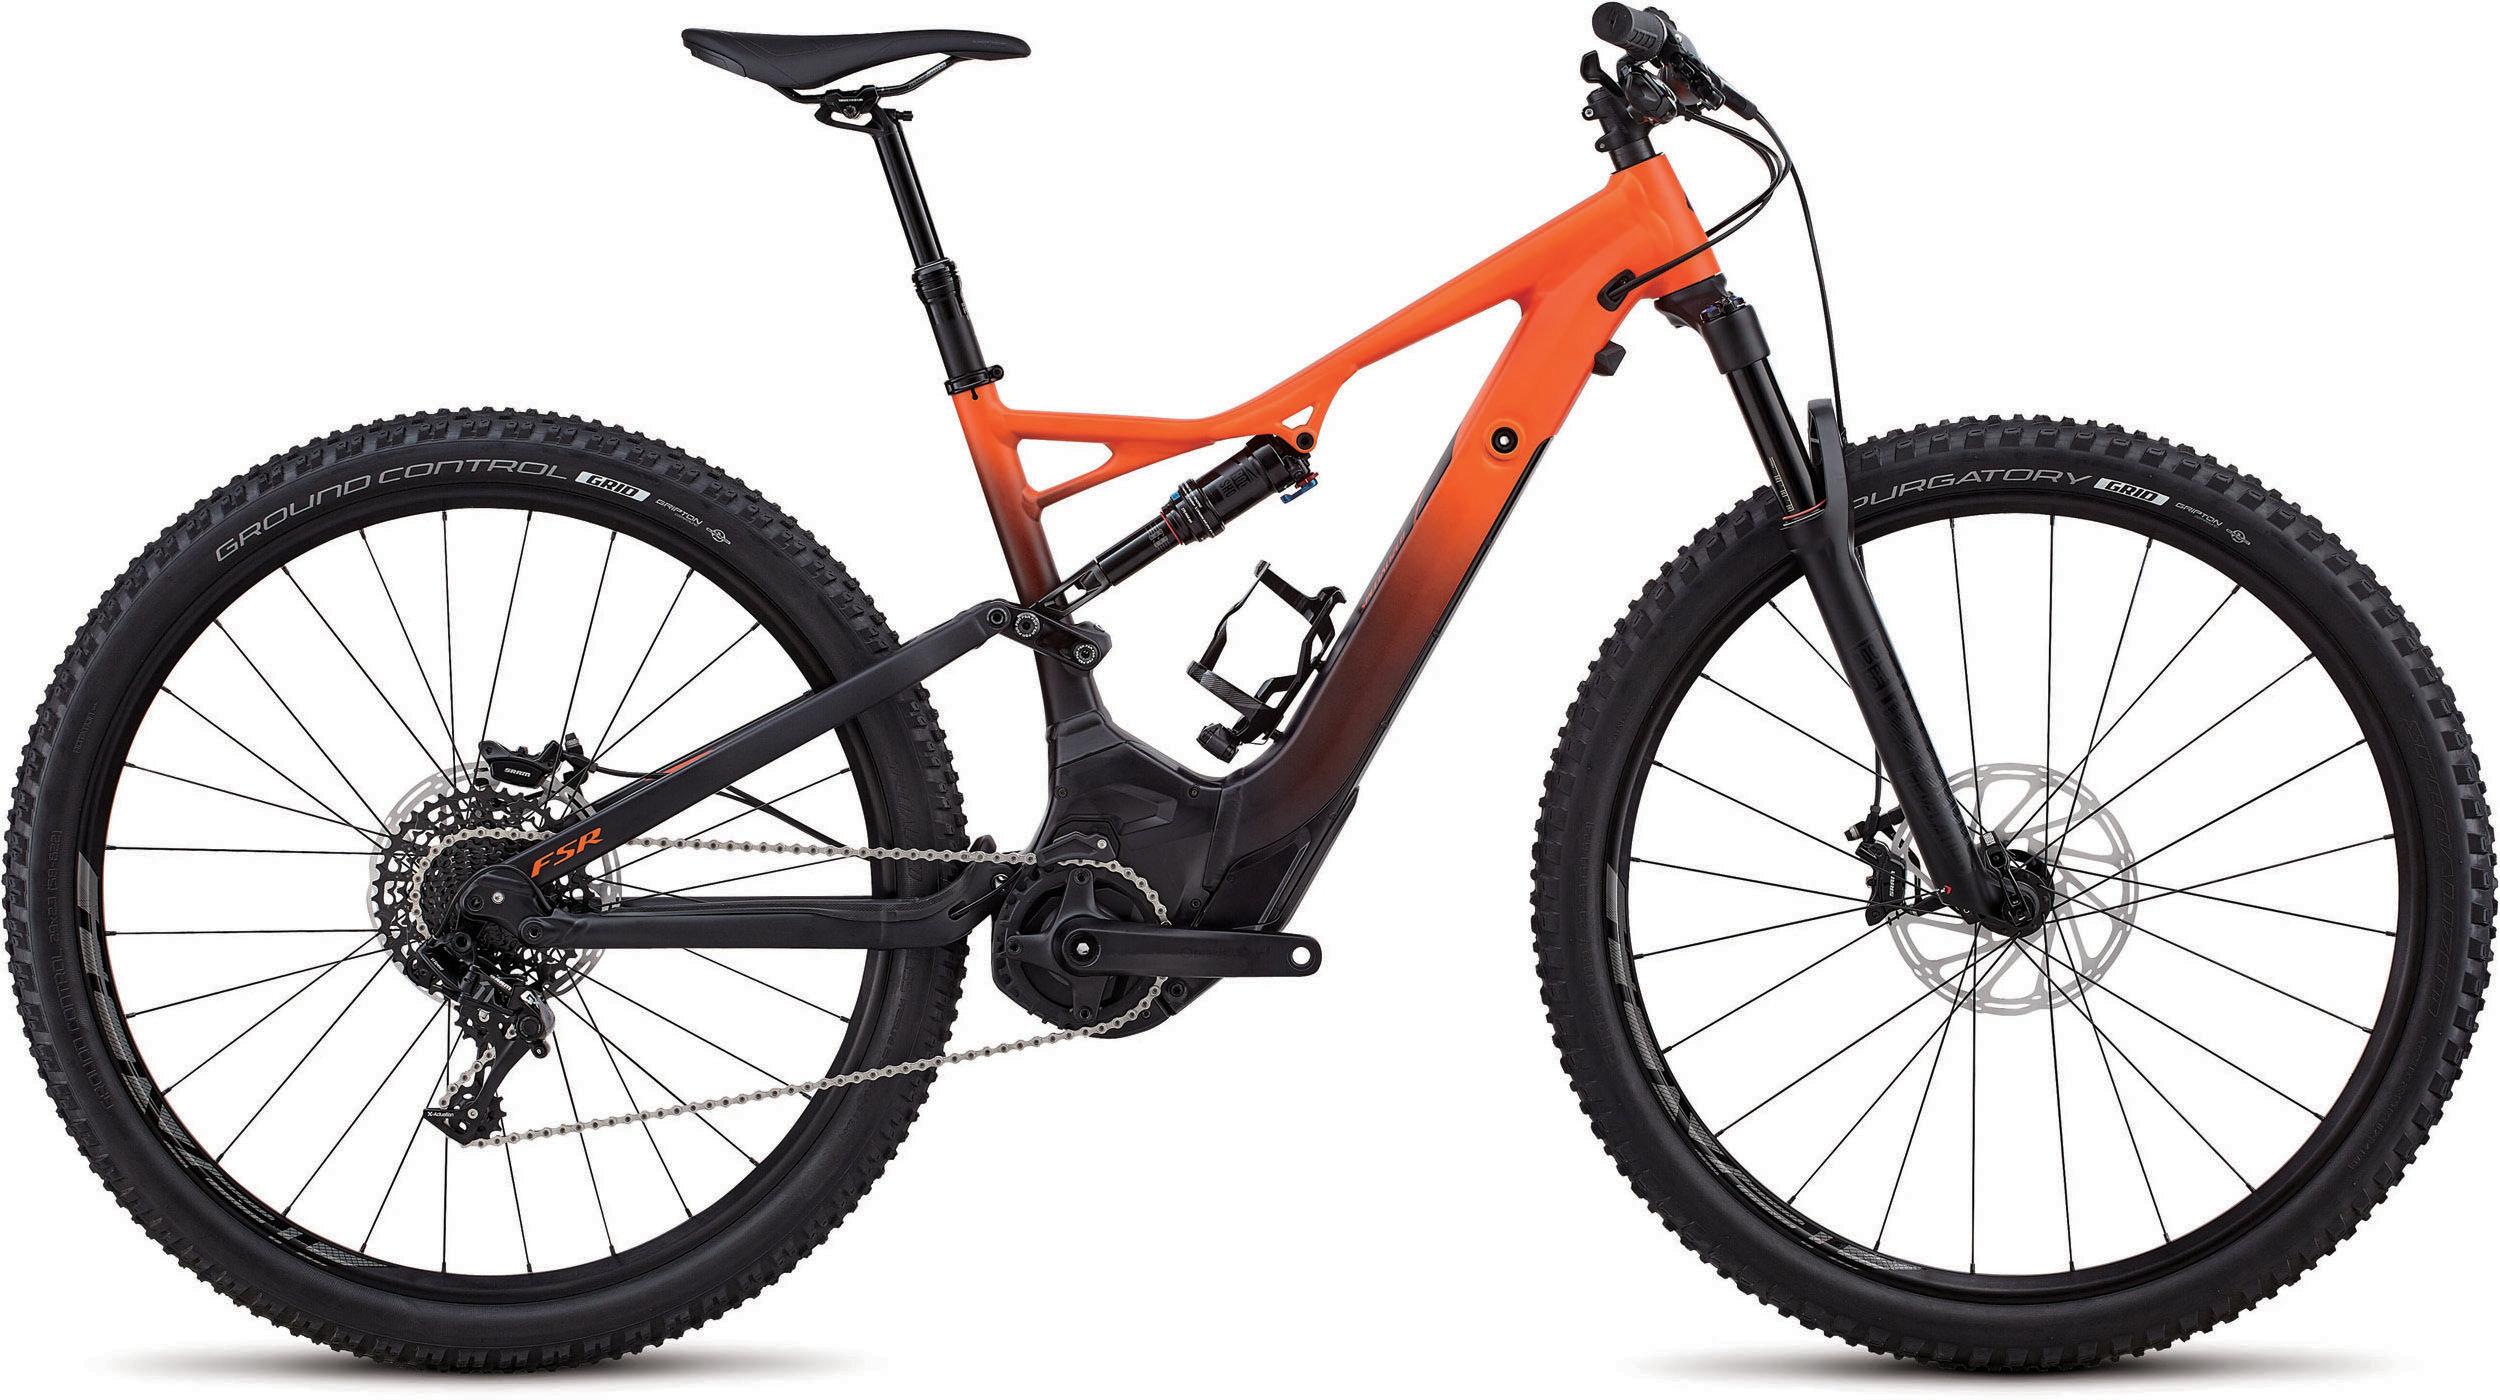 Specialized Men´s Turbo Levo FSR Short Travel Comp 29 Moto Orange / Black S - schneider-sports